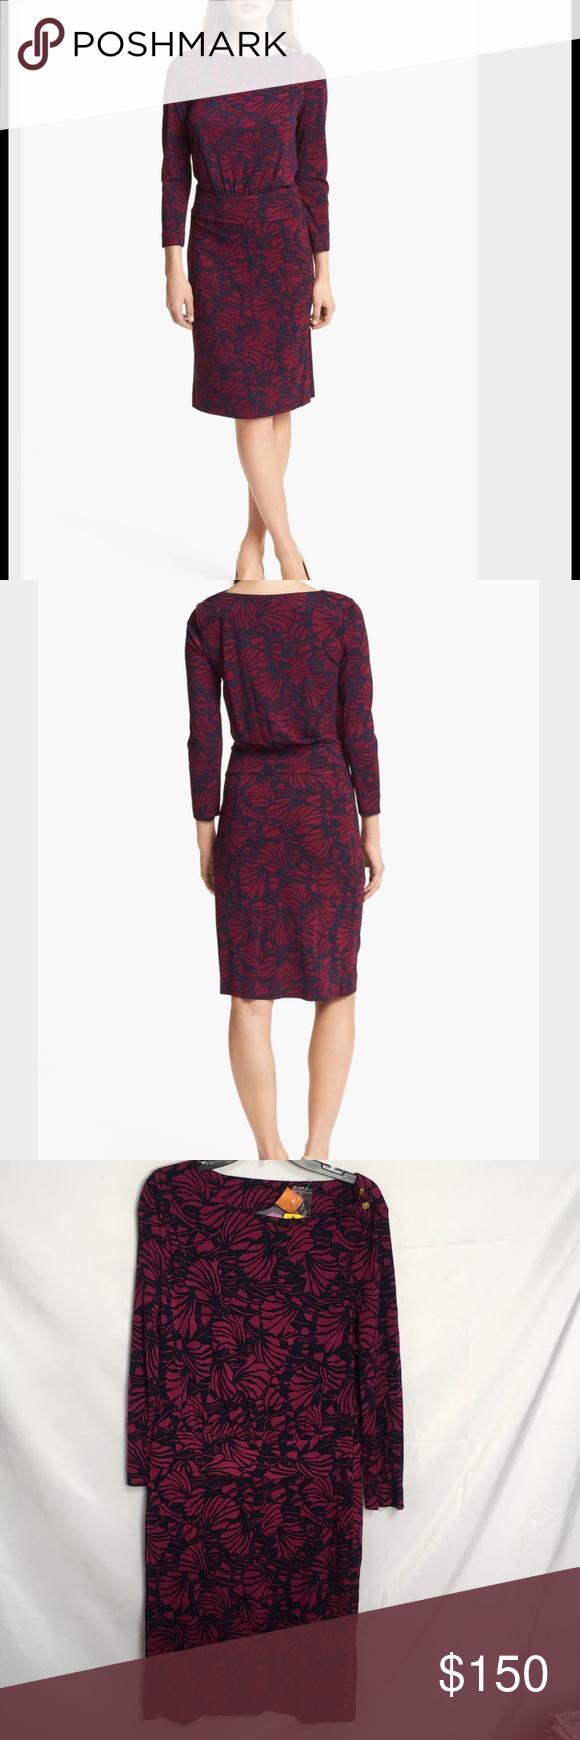 #126 Tory Burch dress 🐥💛 Tory Burch Etta print blouson dress Tory Burch Dresses Midi